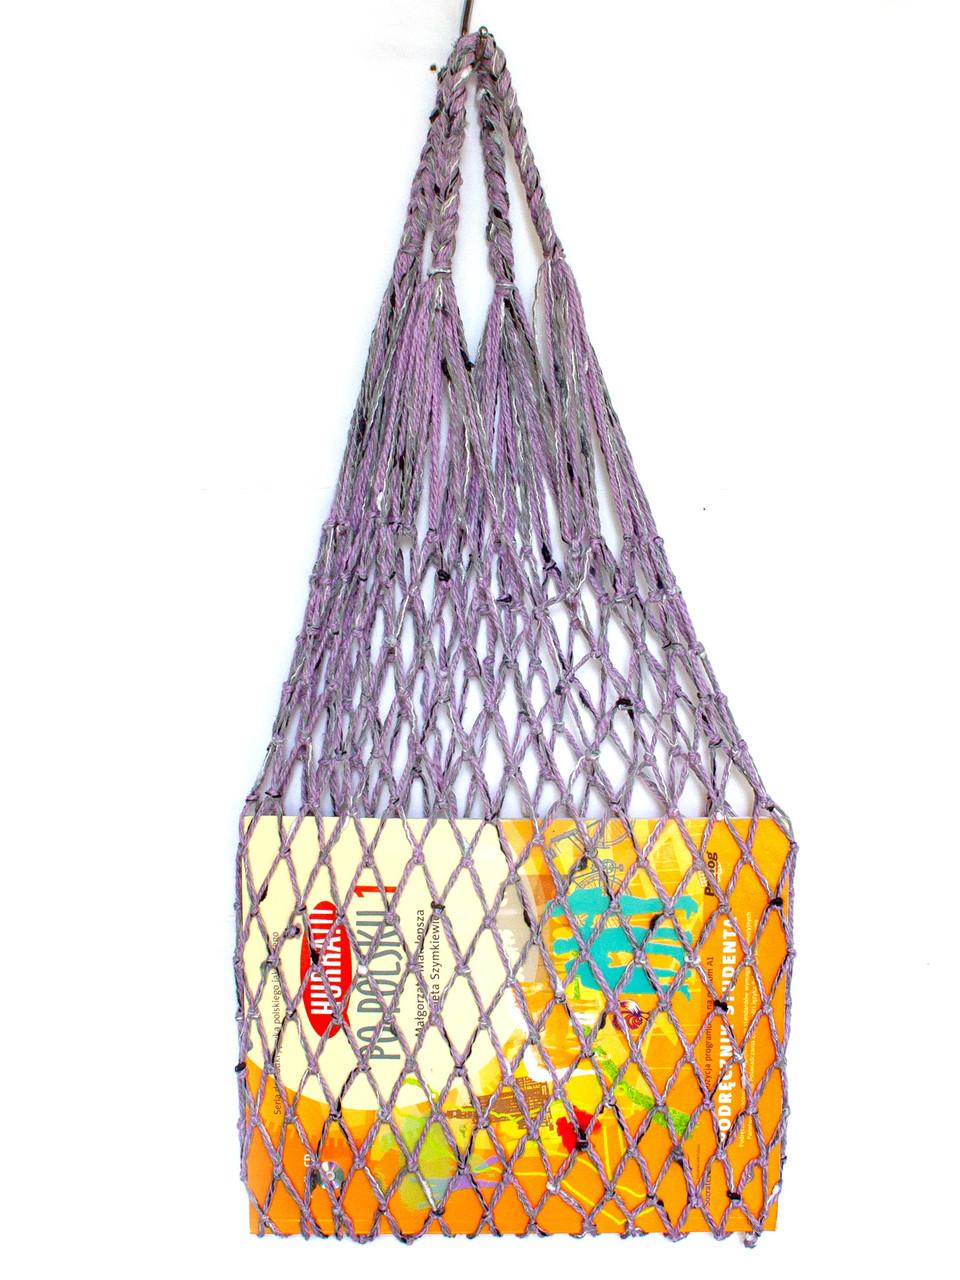 Эко сумка - Авоська -  Эксклюзивная сумка - Шопер сумка